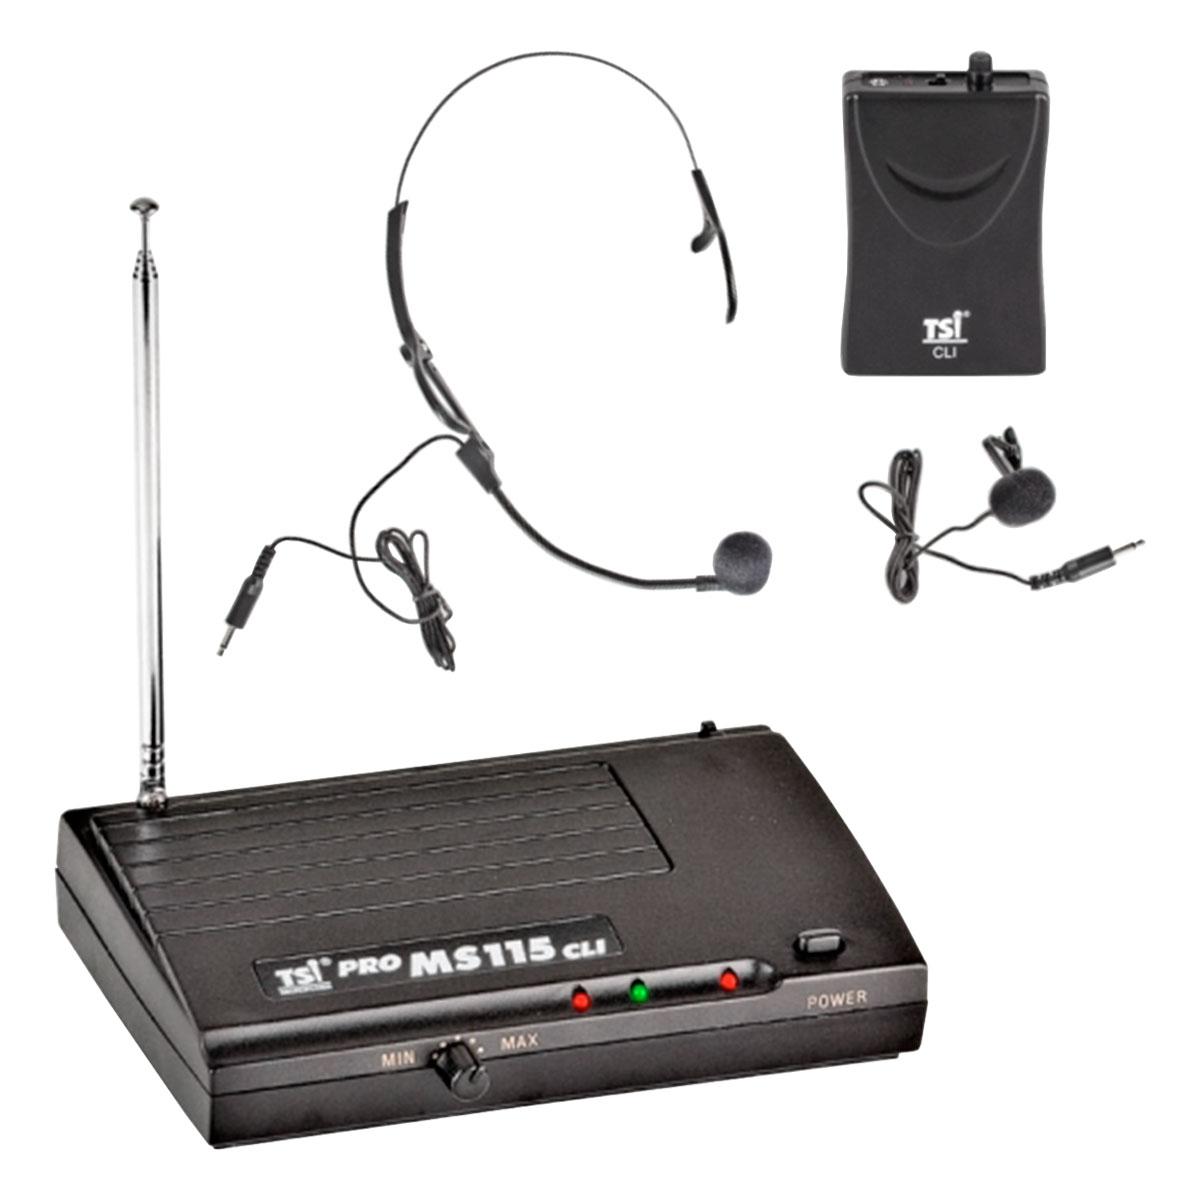 Microfone s/ Fio Headset / Lapela / VHF - MS 115 CLI TSI